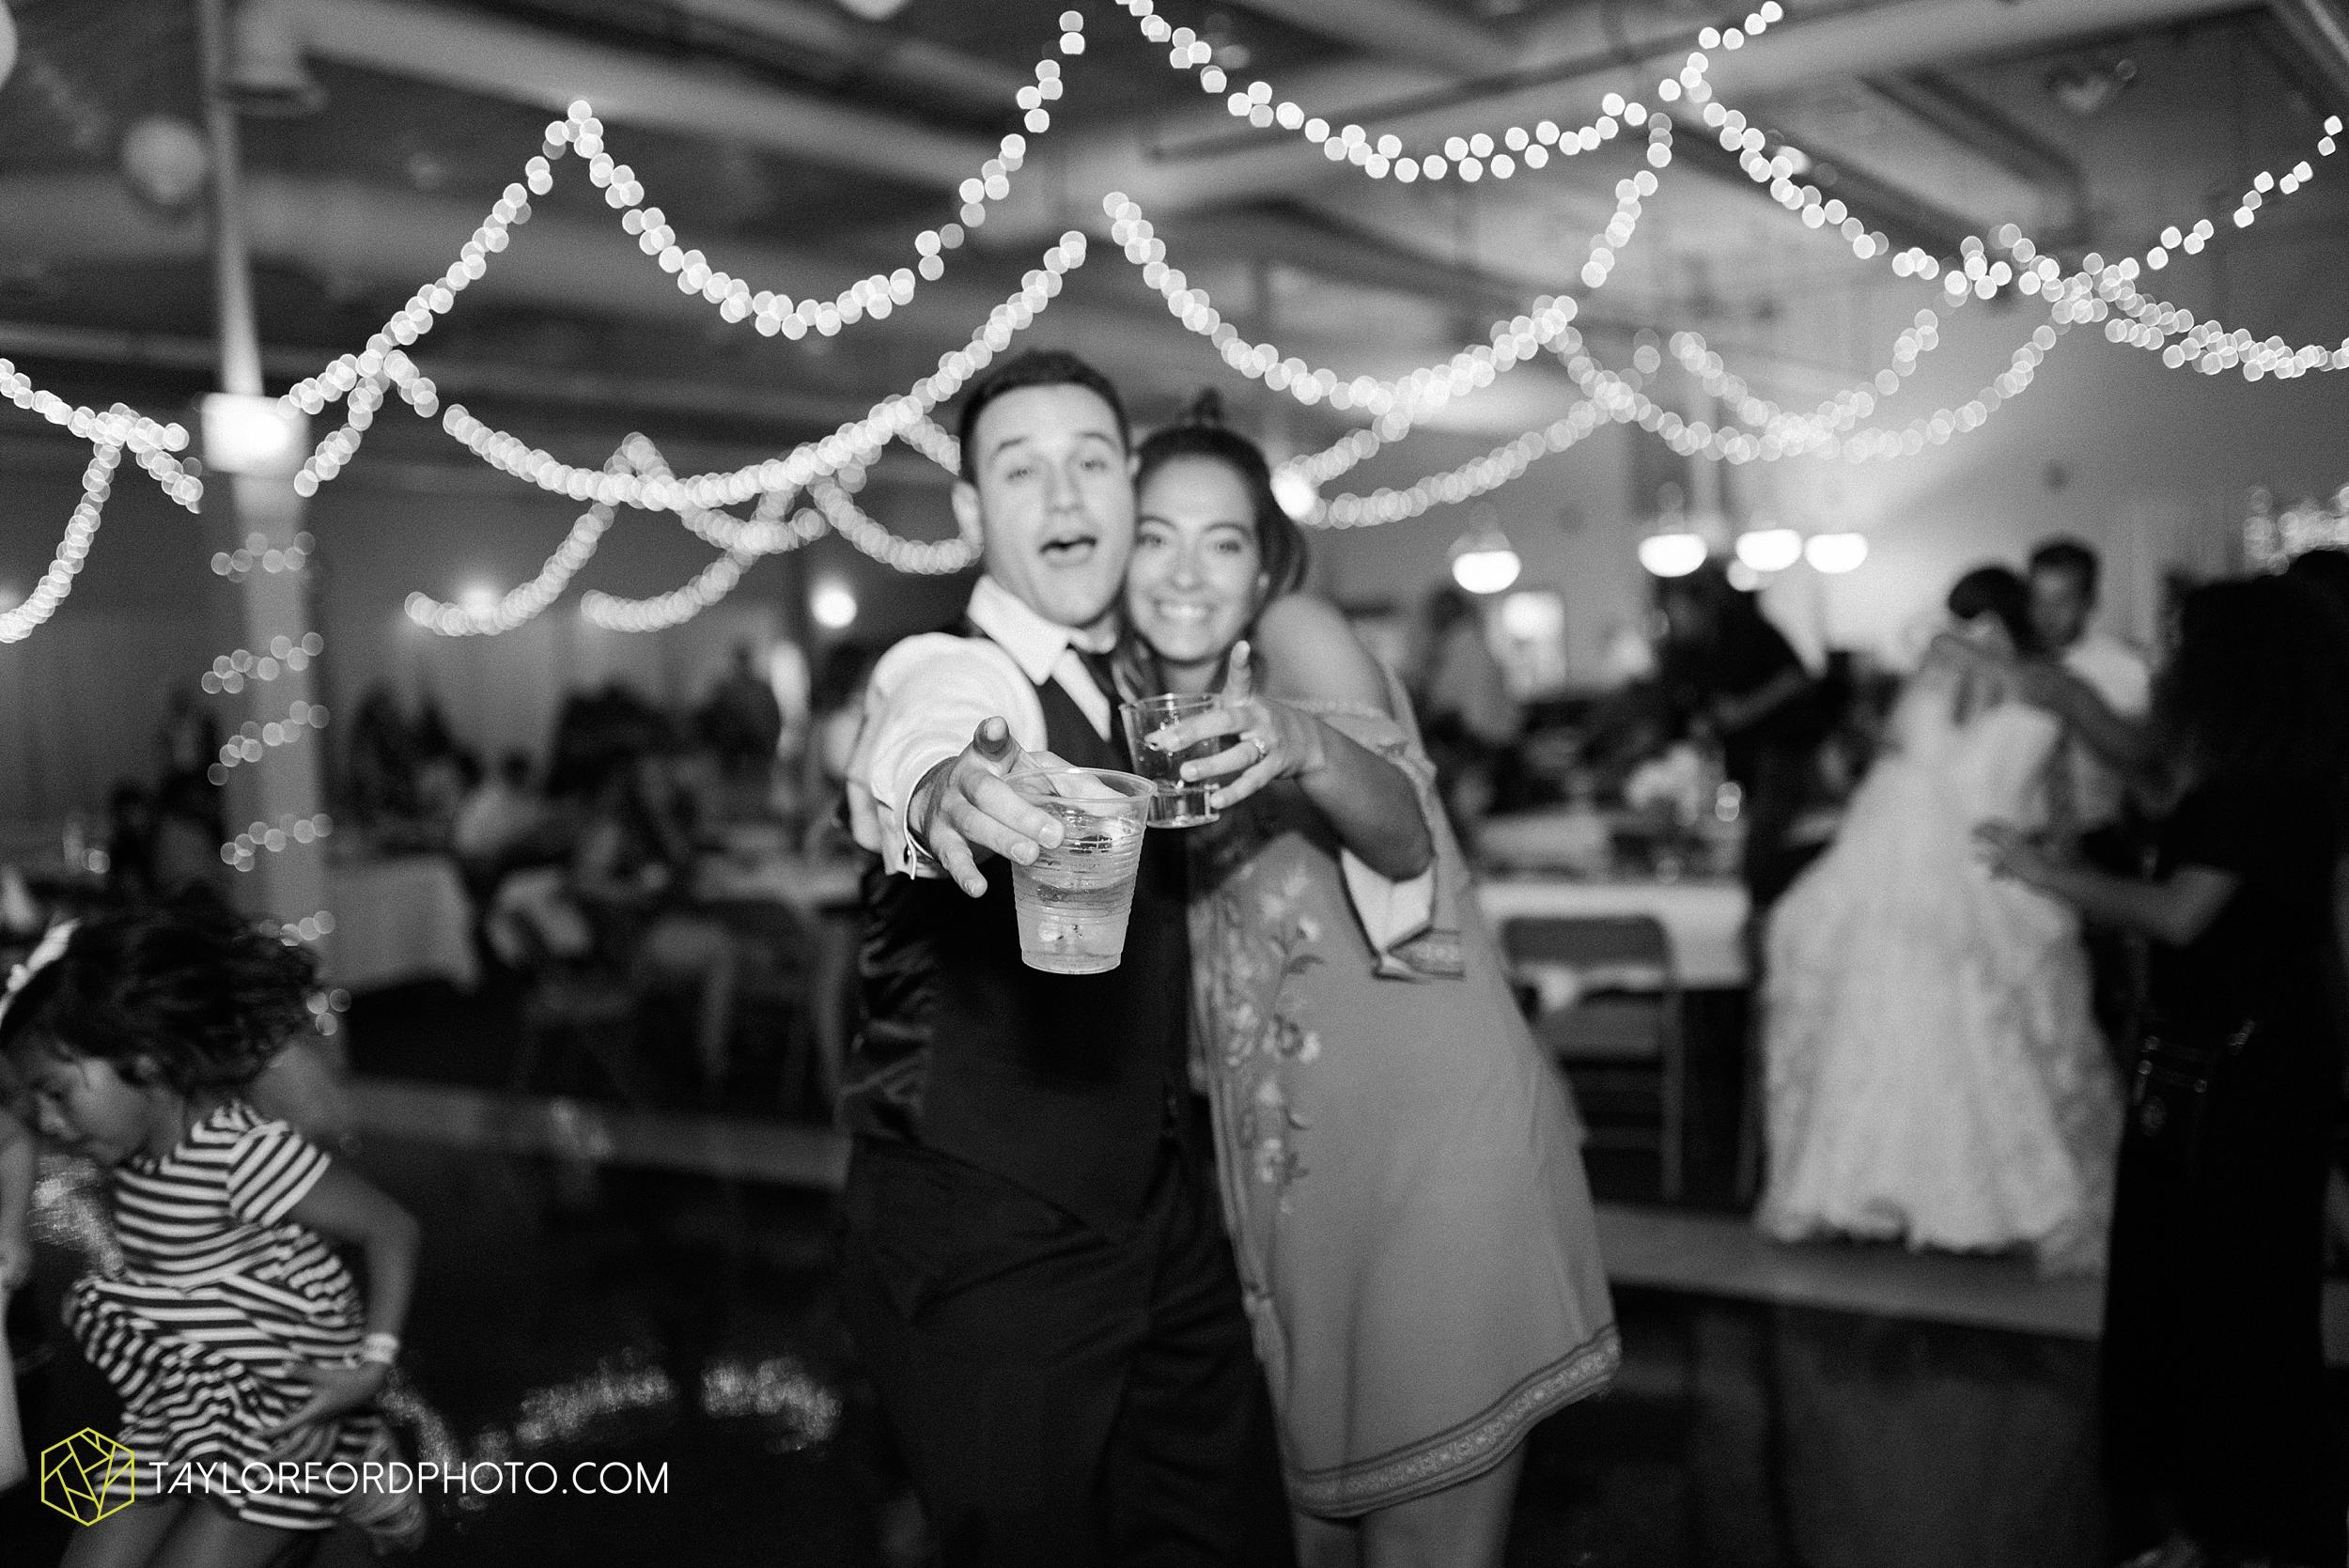 chelsey-zosh-jackson-young-first-united-methodist-church-senior-center-van-wert-ohio-wedding-photographer-taylor-ford-photography_0100.jpg